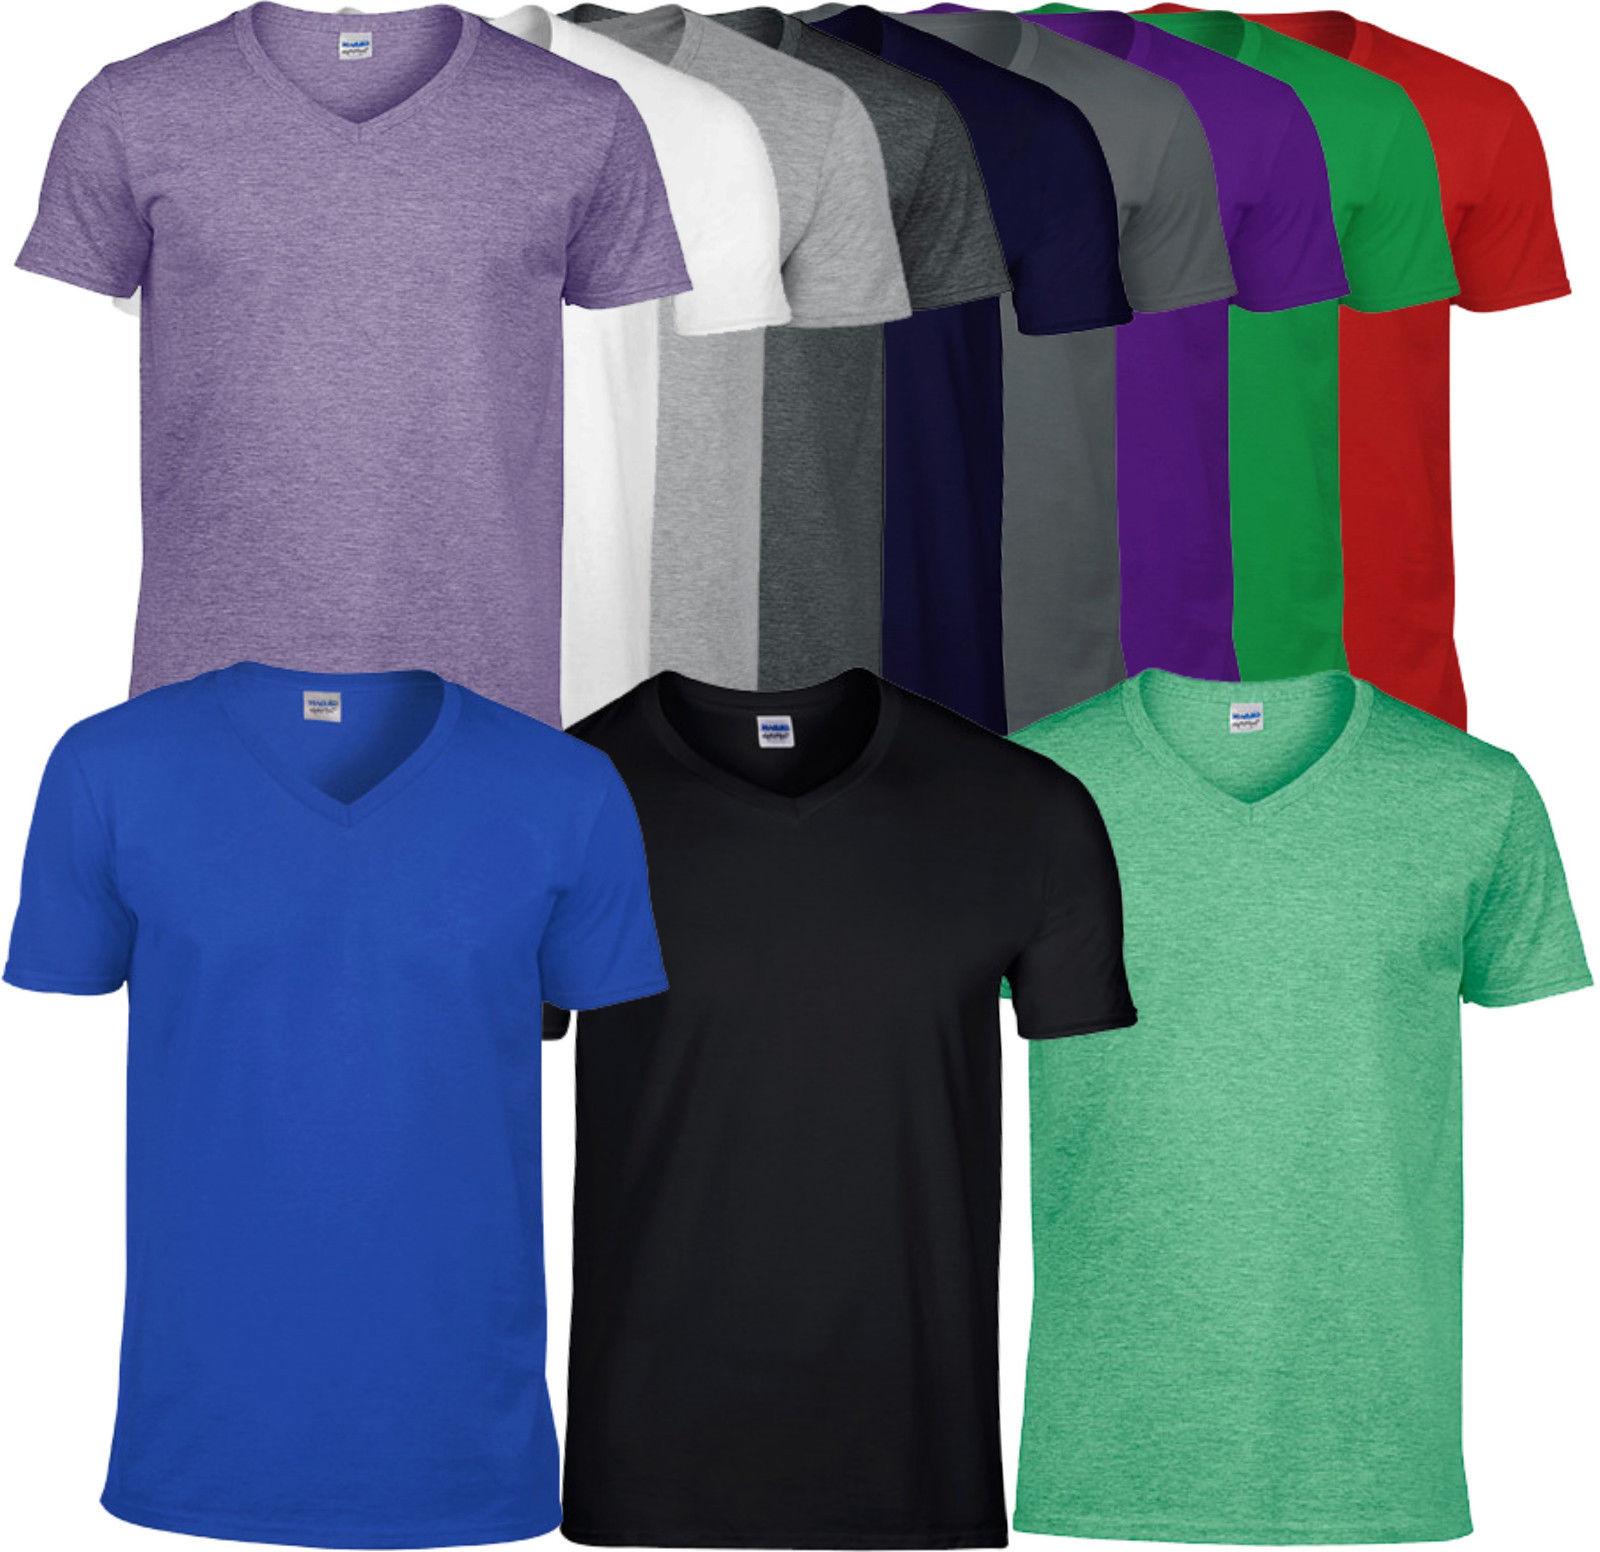 Gildan Herren Softstyle V-Neck T-Shirt kurzarm Unisex S M L XL XXL (C) NEU TOP